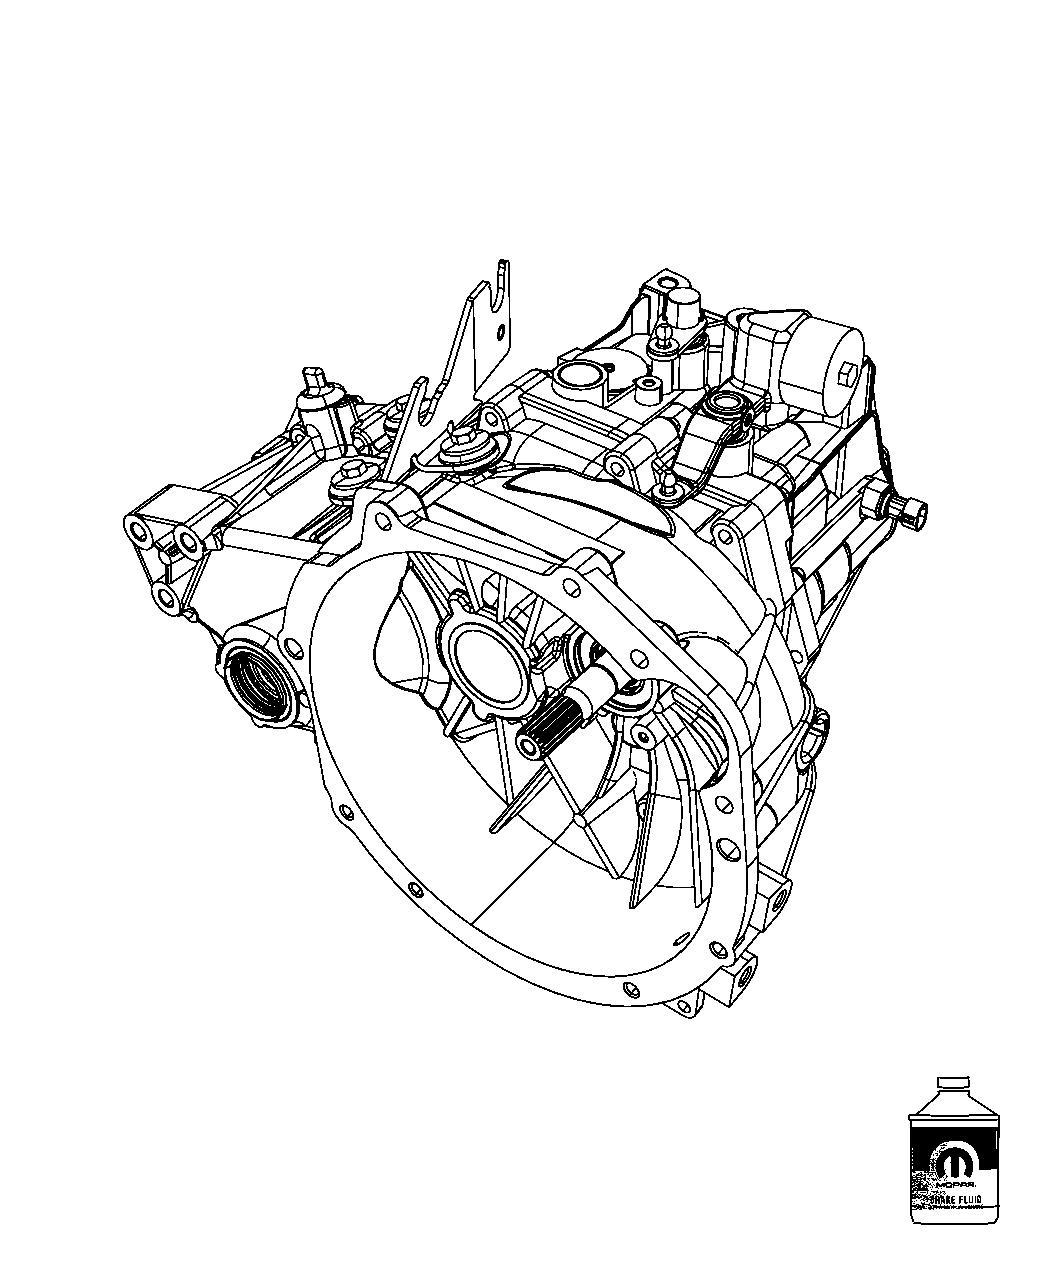 2012 Jeep Patriot Transaxle, transmission. 5 speed